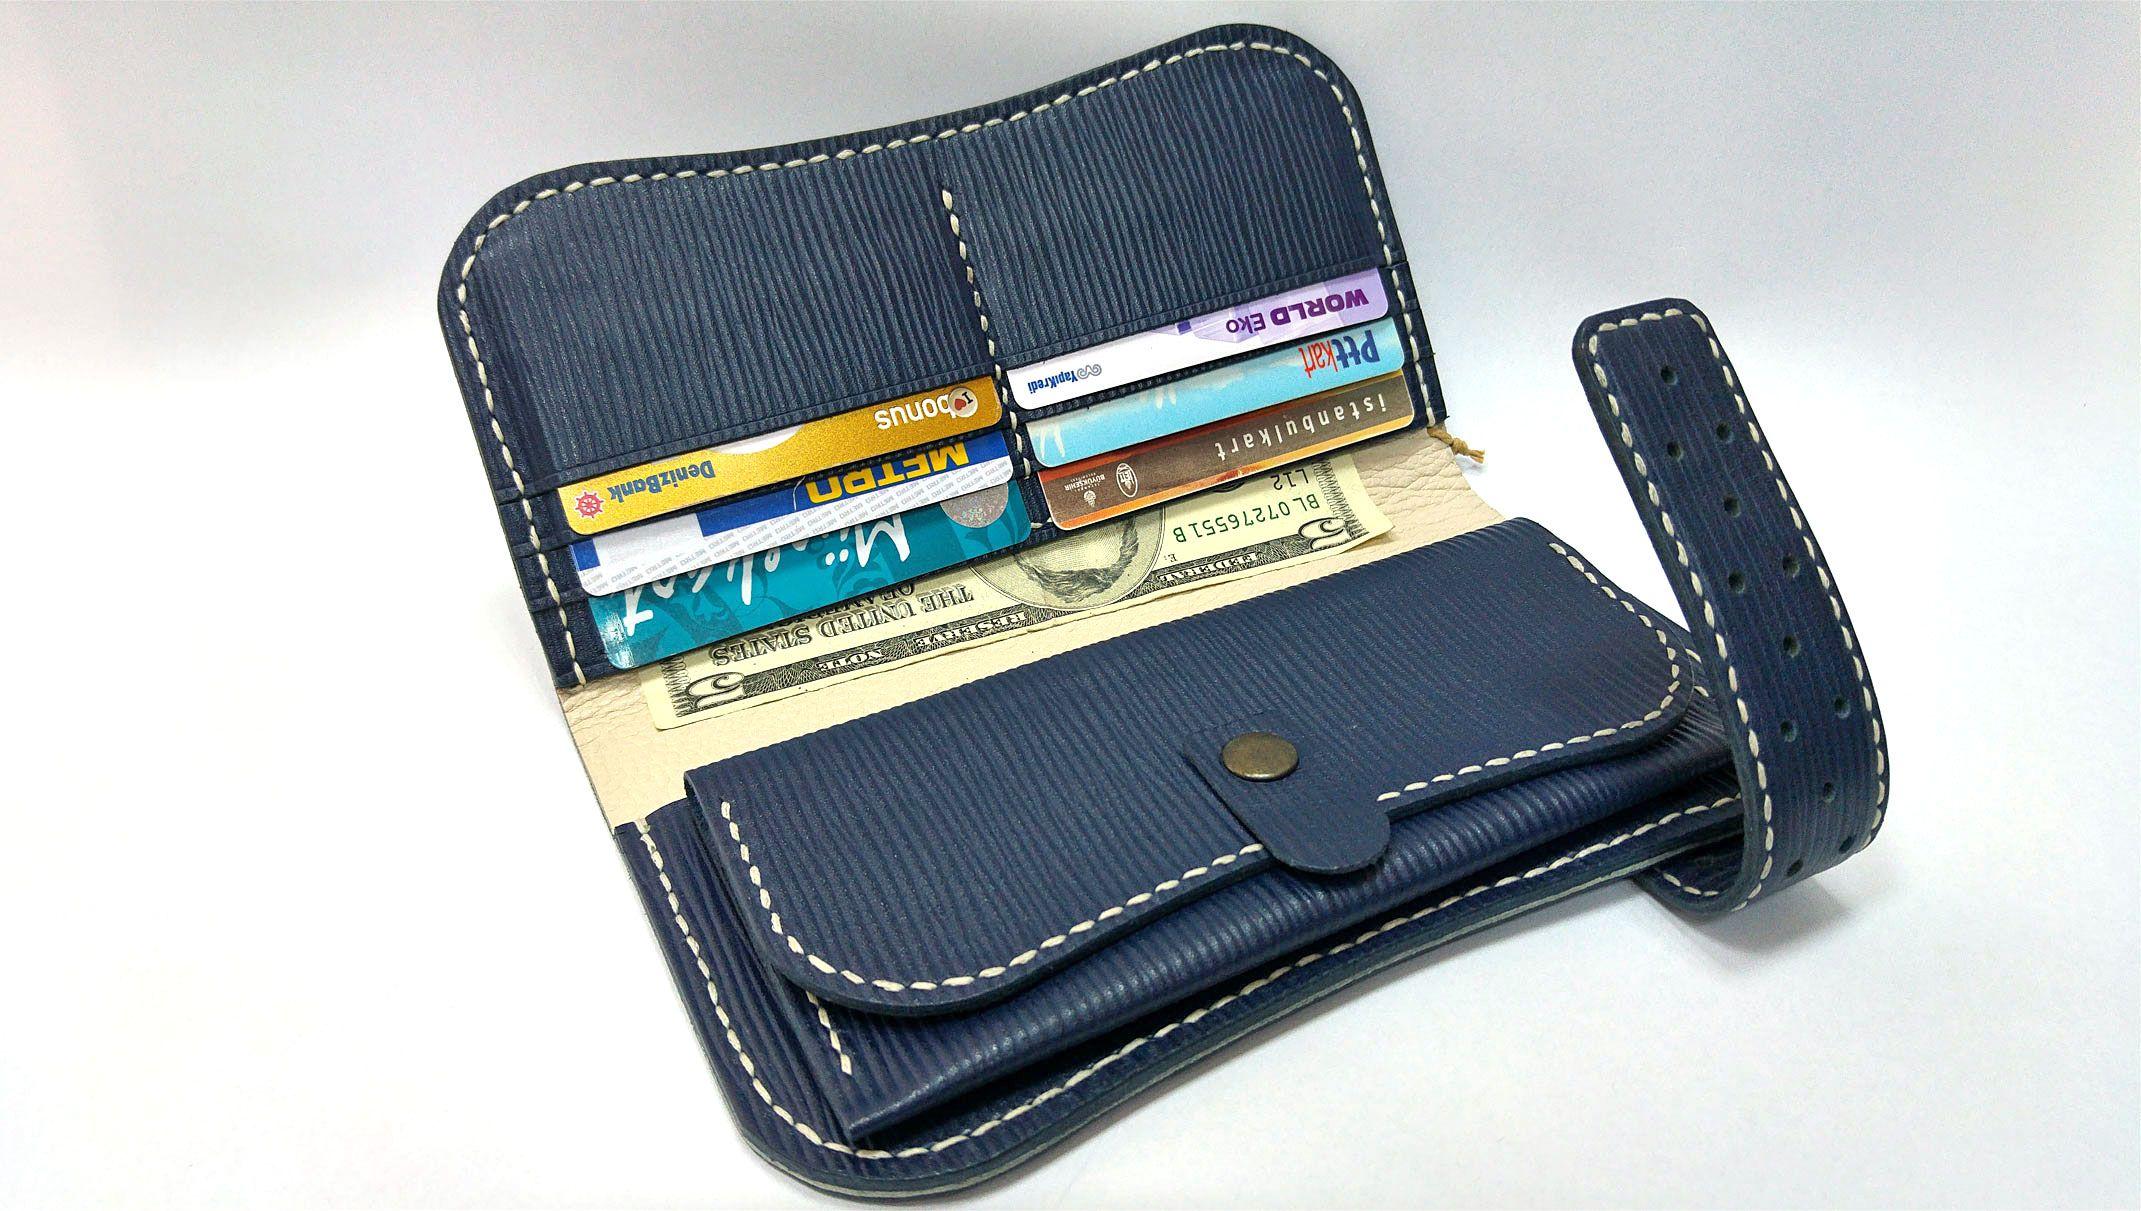 Cuzdan Bayan Cuzdan Gercek Deri Bayan Cuzdan Wallet Women Wallet Leather Wallet El Yapimi Gercek Deri Bayan Cuzdan Handmade Leather Women Cuzdan Cantalar Deri